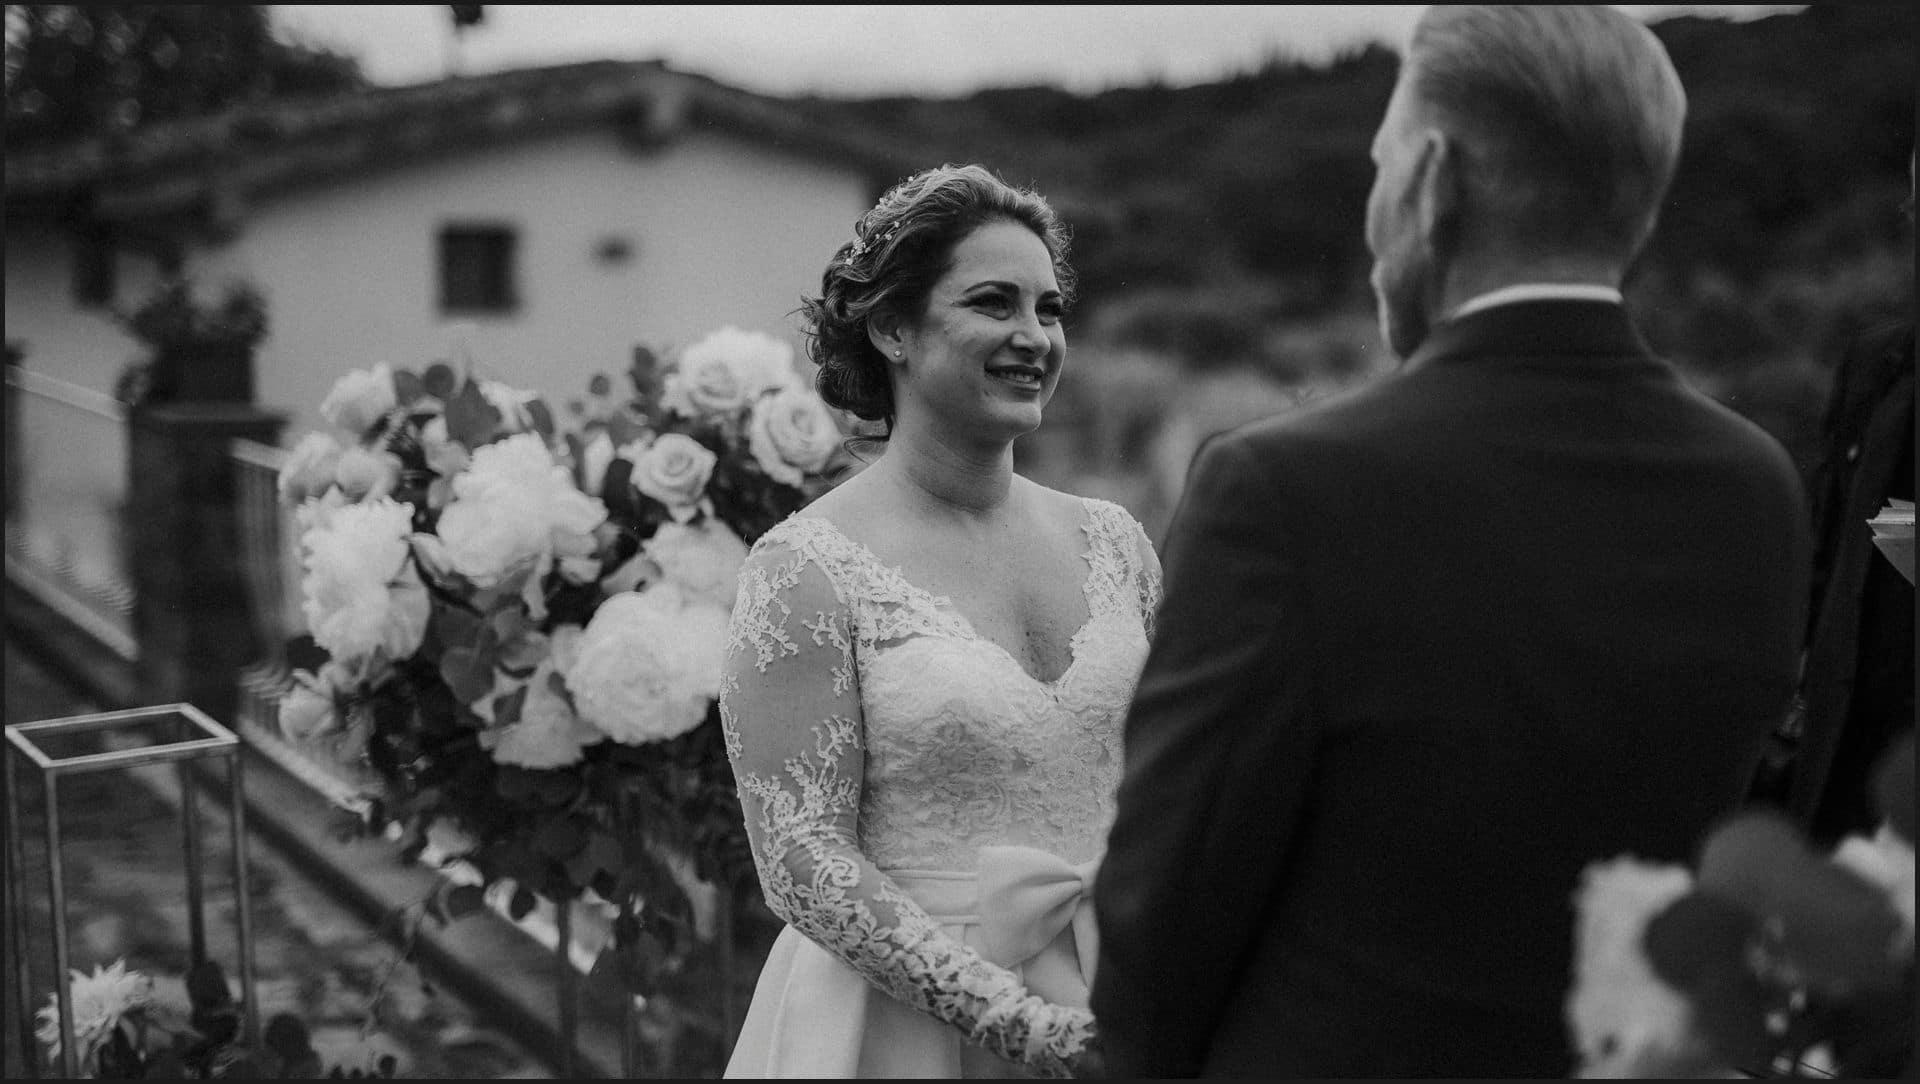 tuscany, destination wedding, chianti, wedding ceremony, black and white, bride, groom